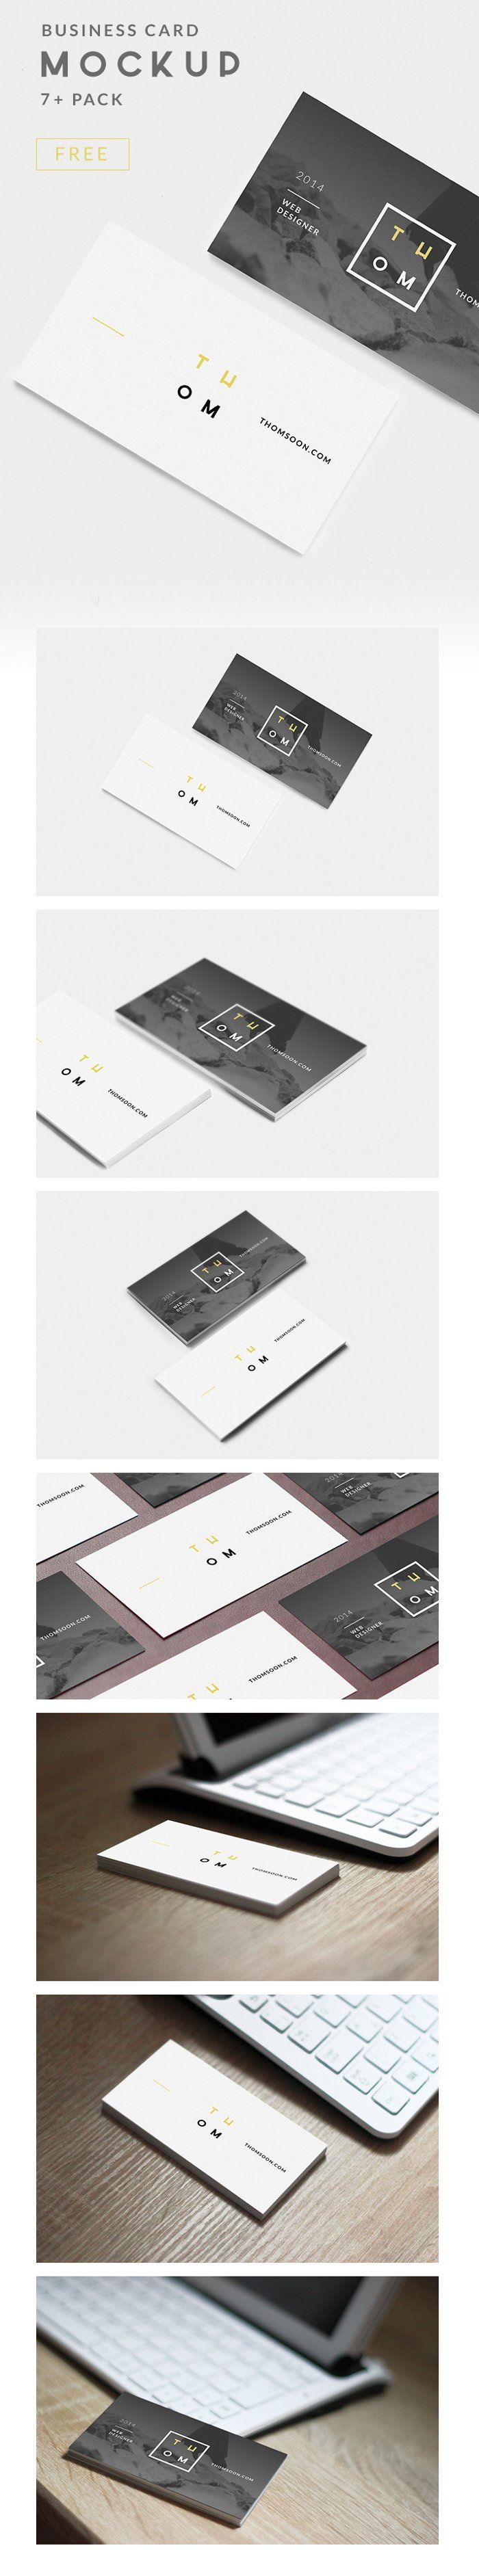 Free PSD: 7+ Business Card Mockups by Tomasz Mazurczak #mockup #psd #businesscard